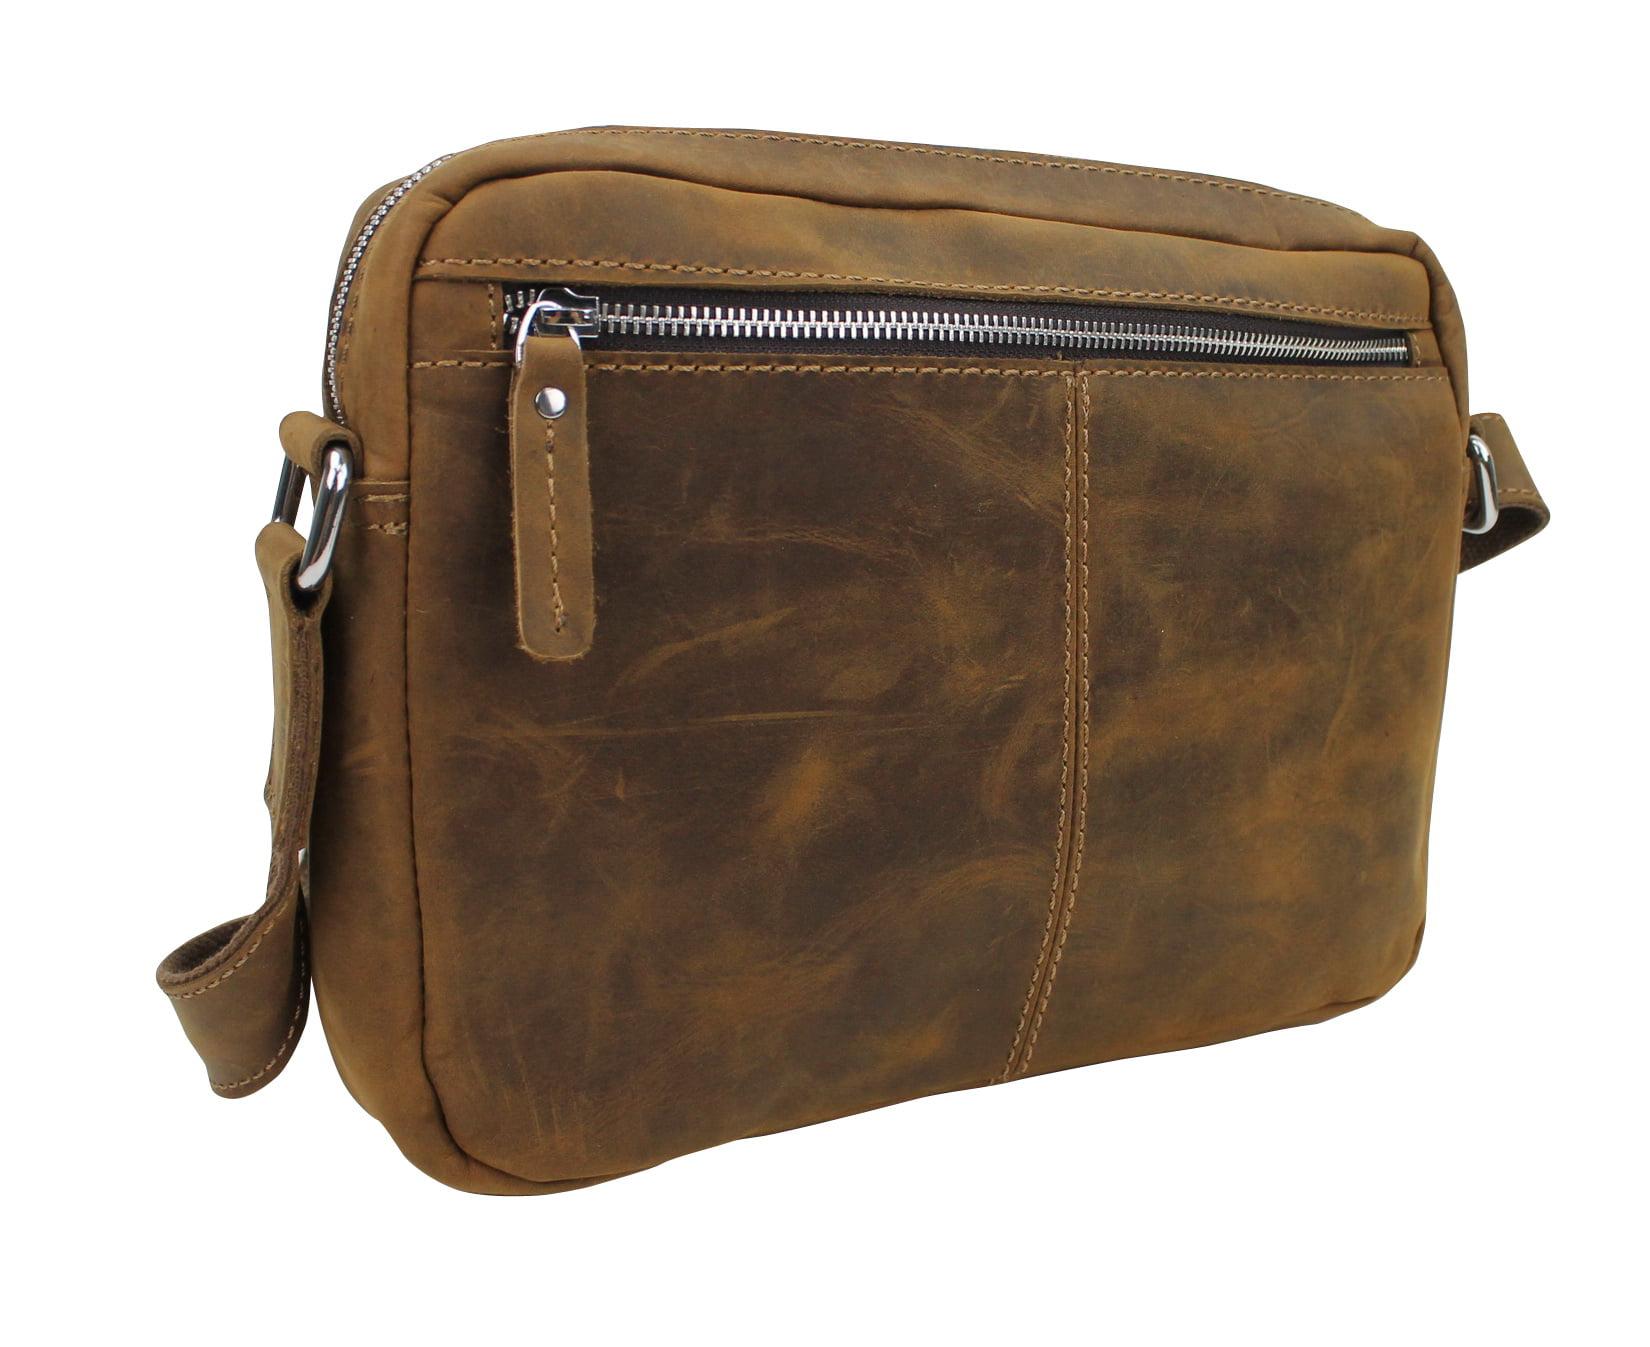 Vintage Distress Vintage Full Grain Leather Leather Casual Messenger Bag LM09